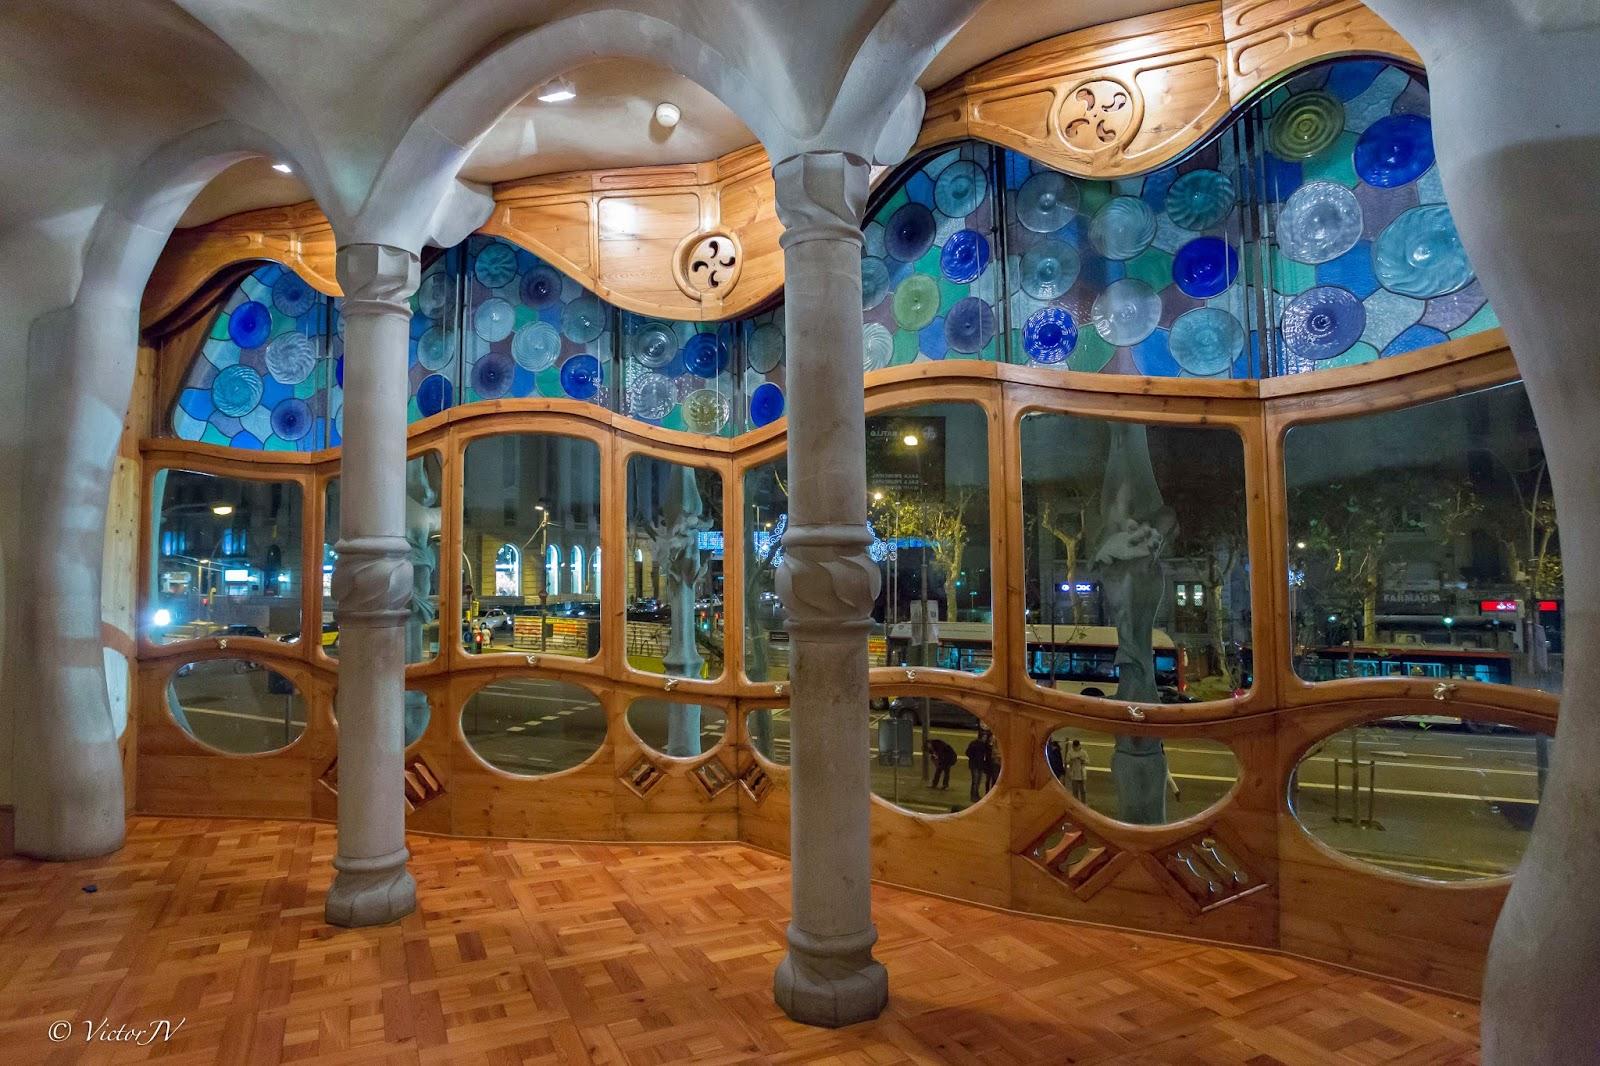 Casa Batll Antoni Gaudi Barcelona Spain   ART FOR YOUR WALLPAPER 1600x1066